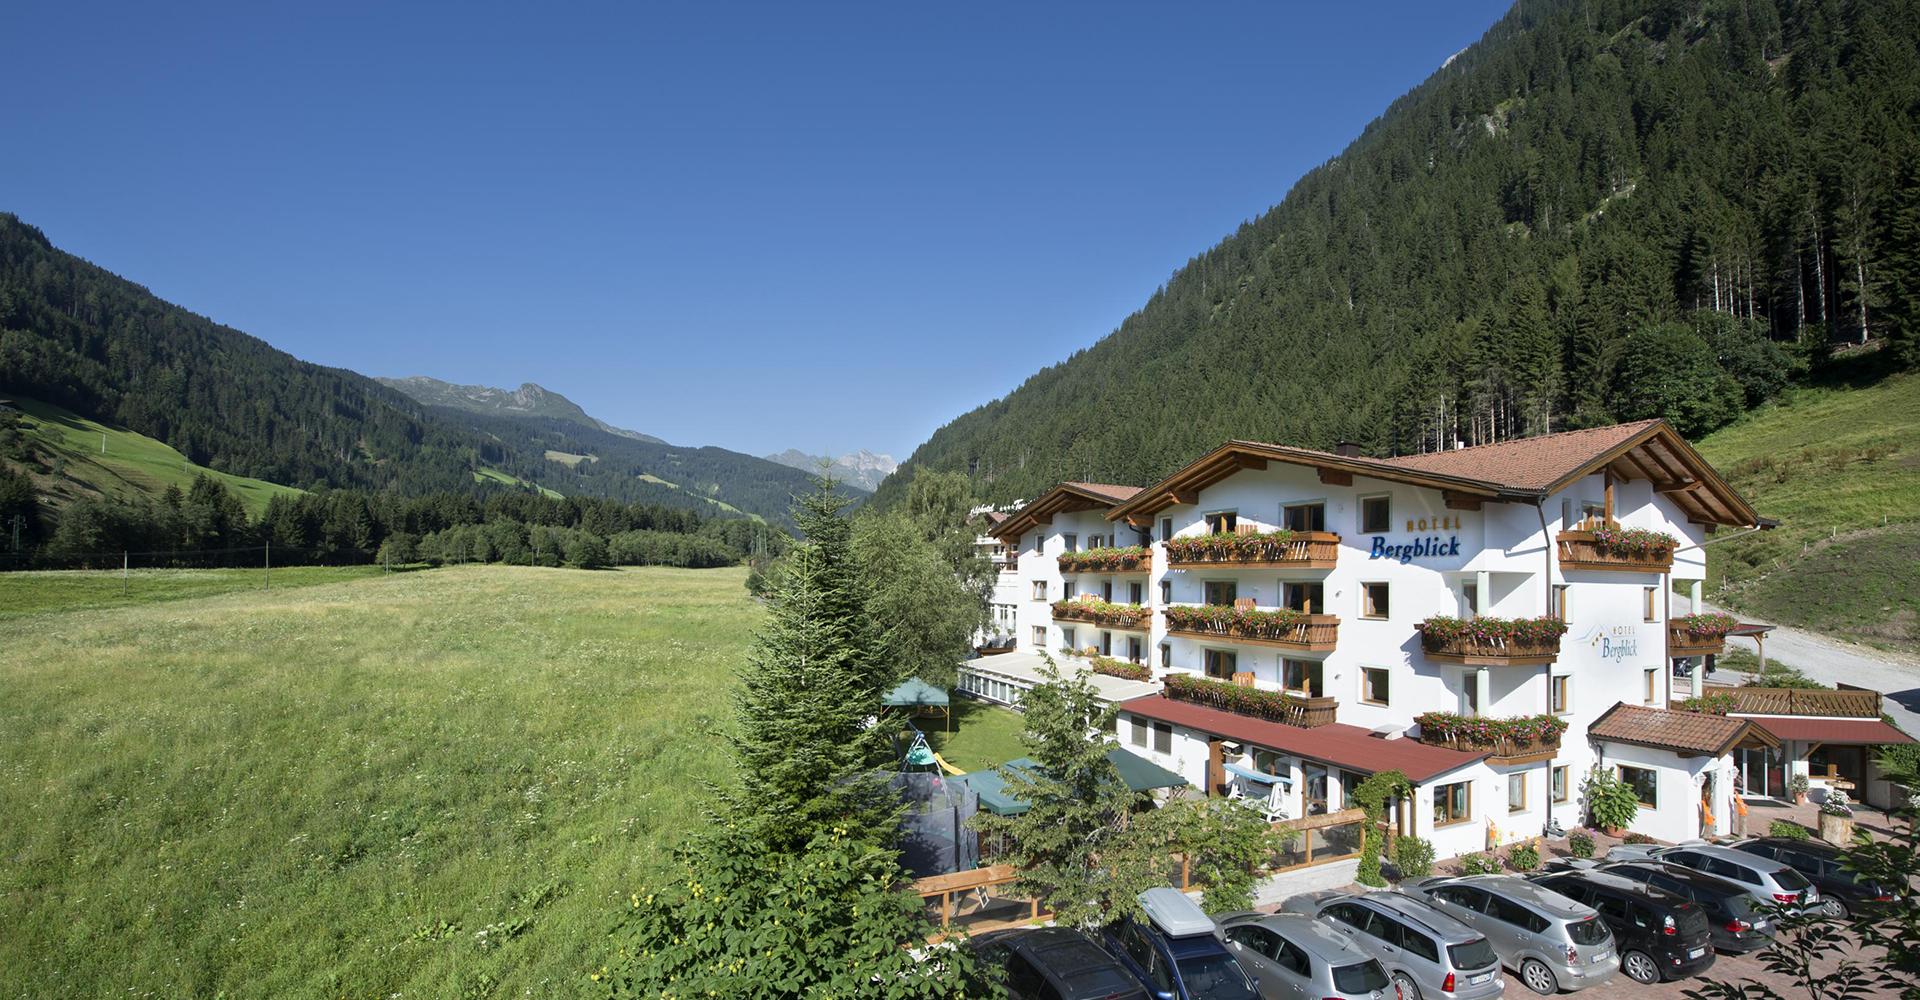 Hotel Bergblick Frontalansicht